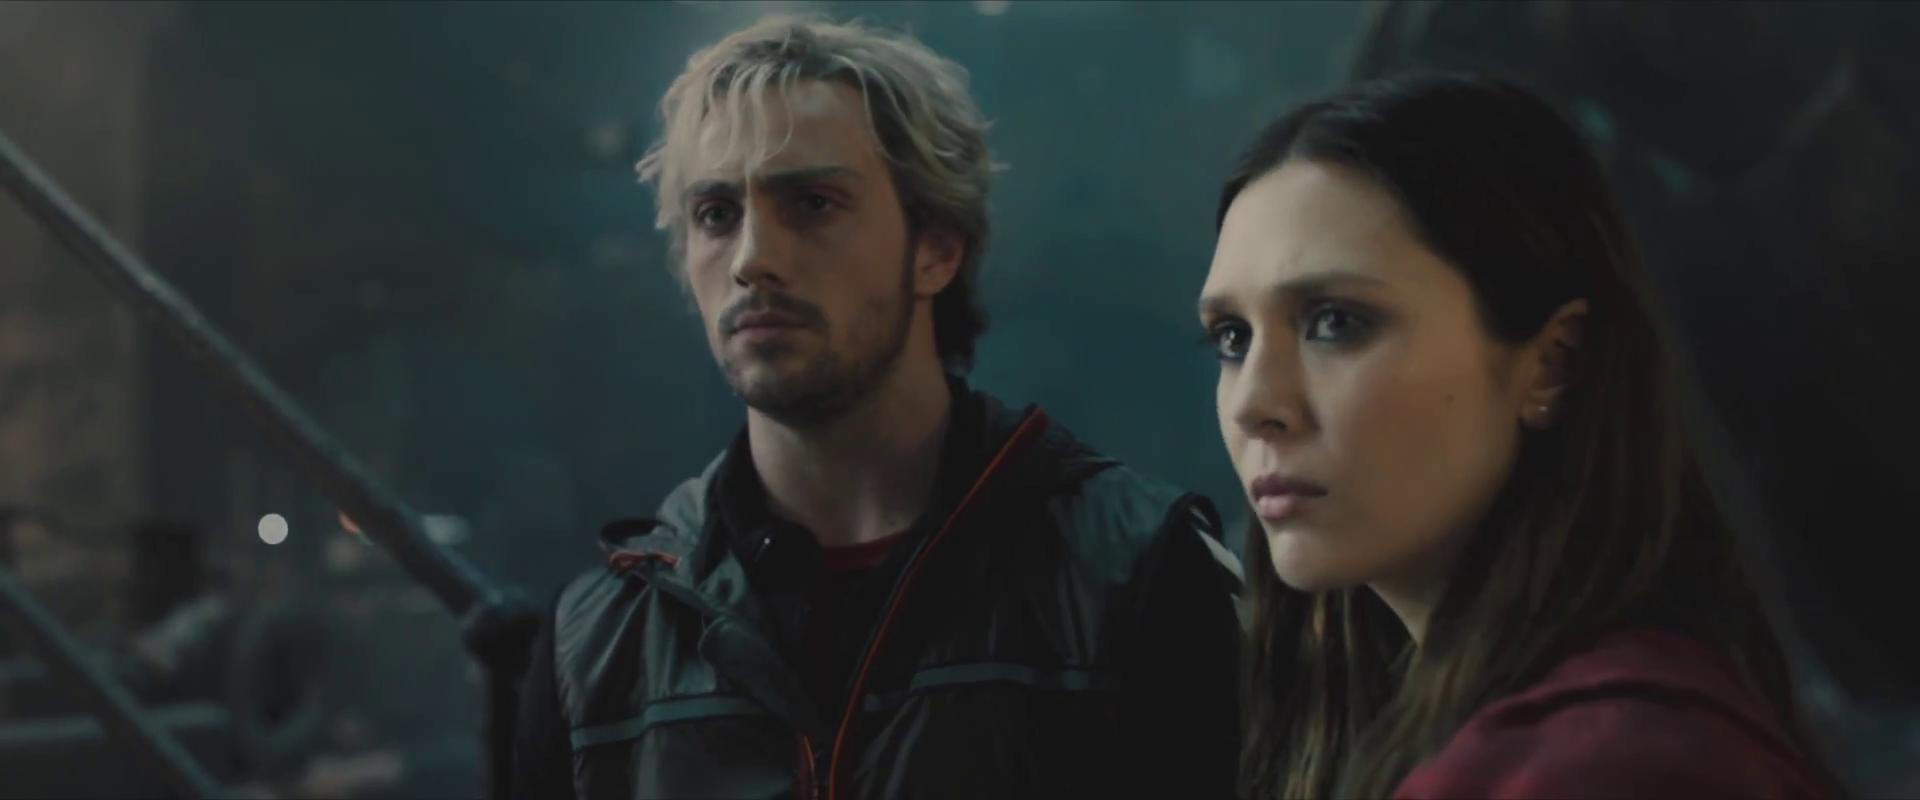 avengers-age-of-ultron-trailer-screengrab-12-aaron-talyor-johnson-elizabeth-olsen.png